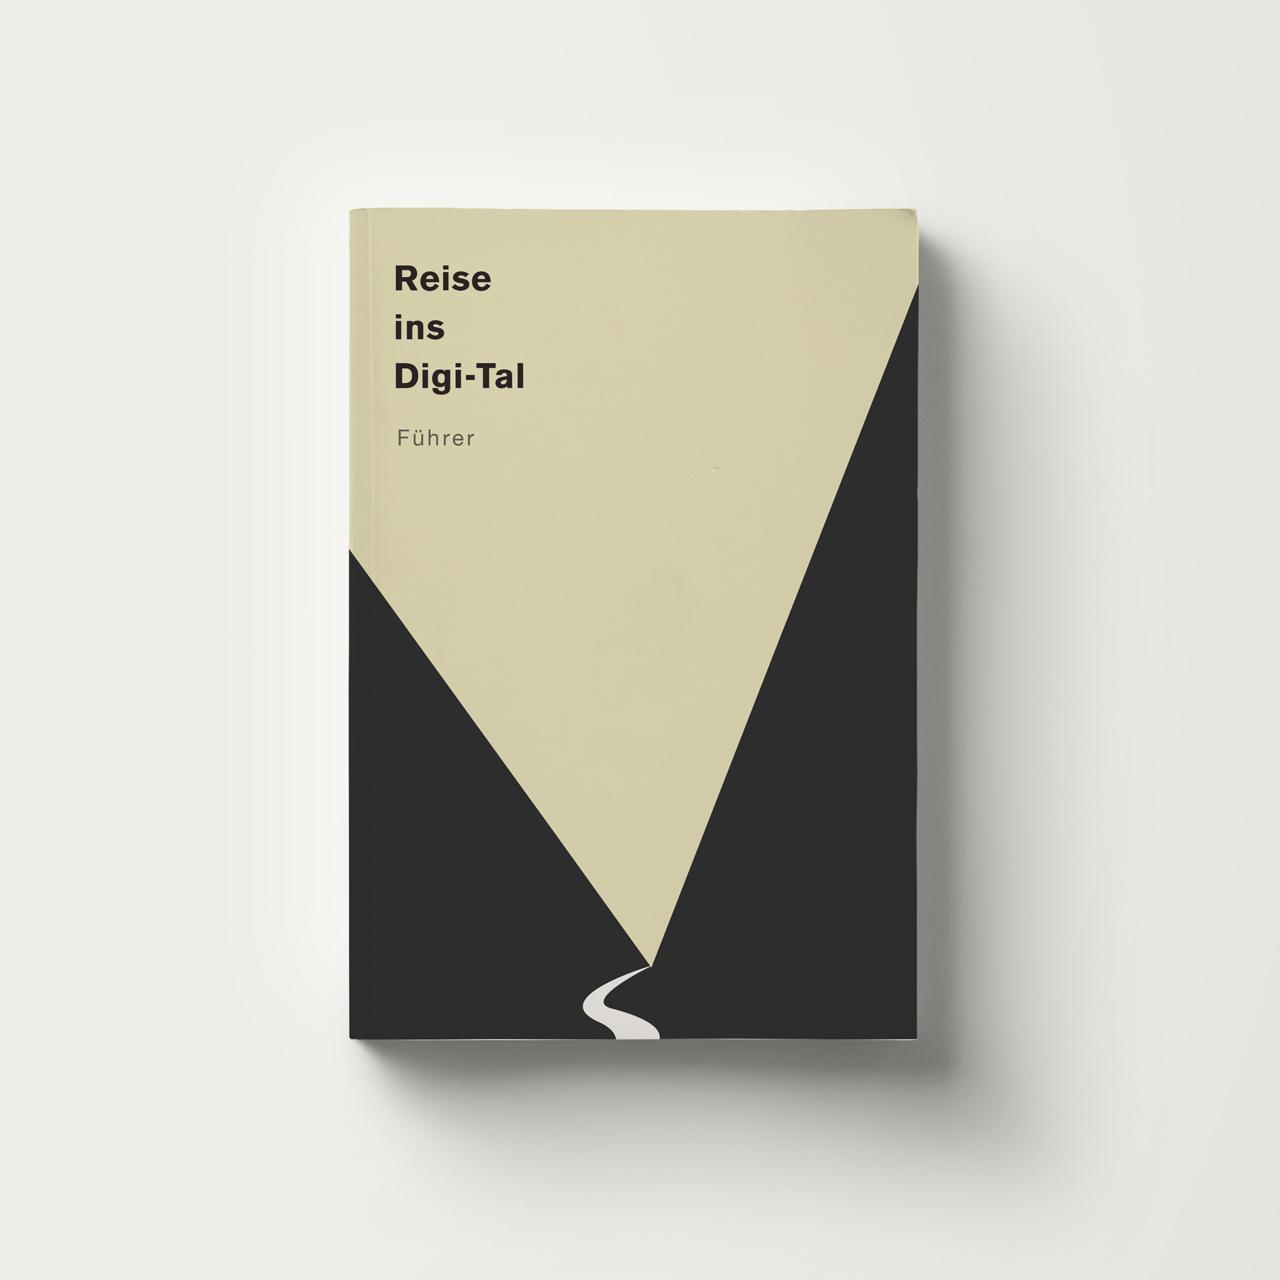 Grafik, Reise ins Digital, jbuechi.ch